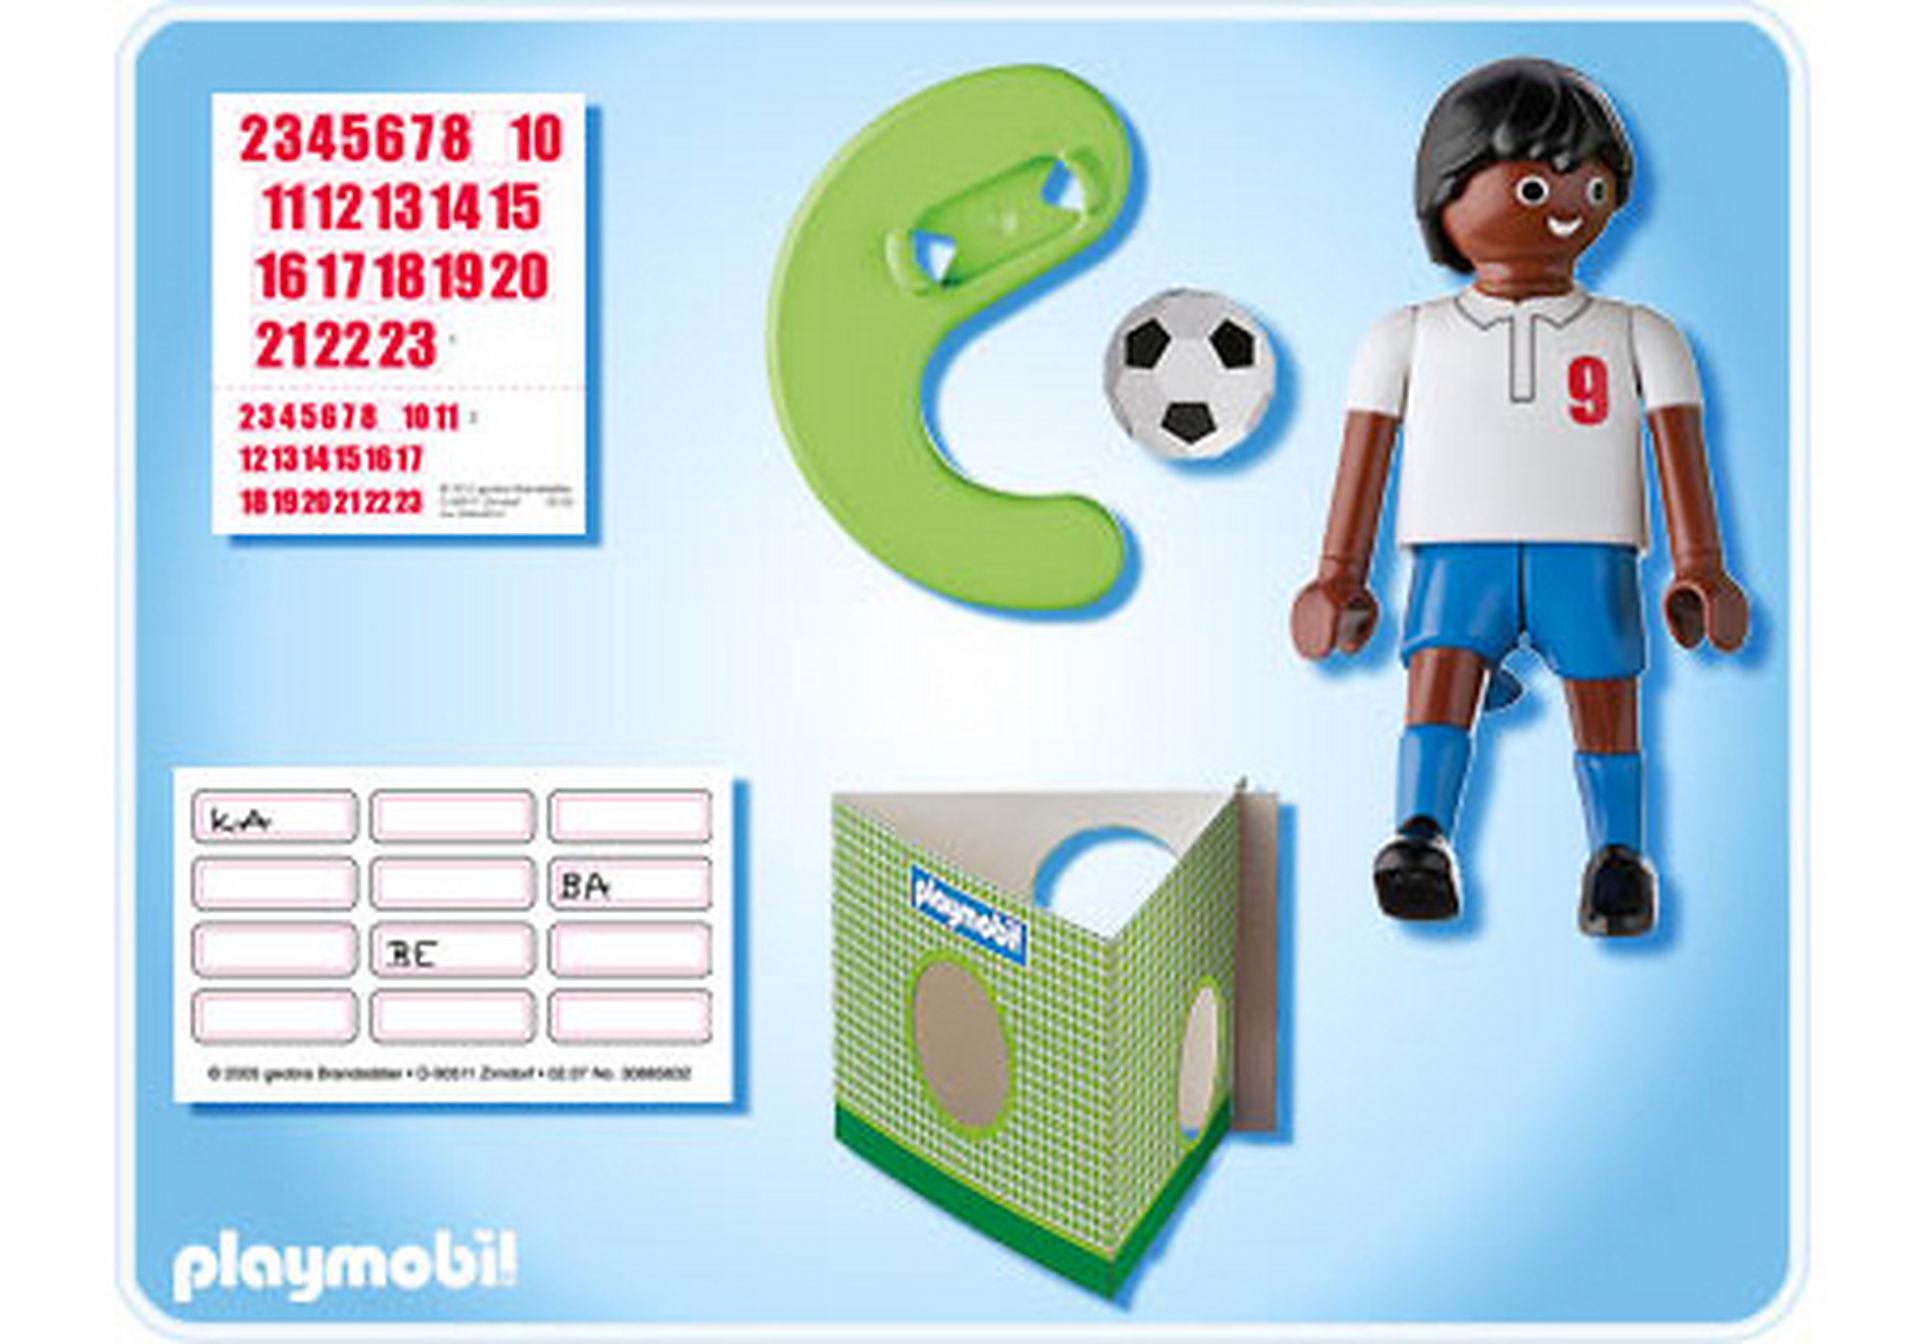 4736-A Fußballspieler England dunkelhäutig zoom image2